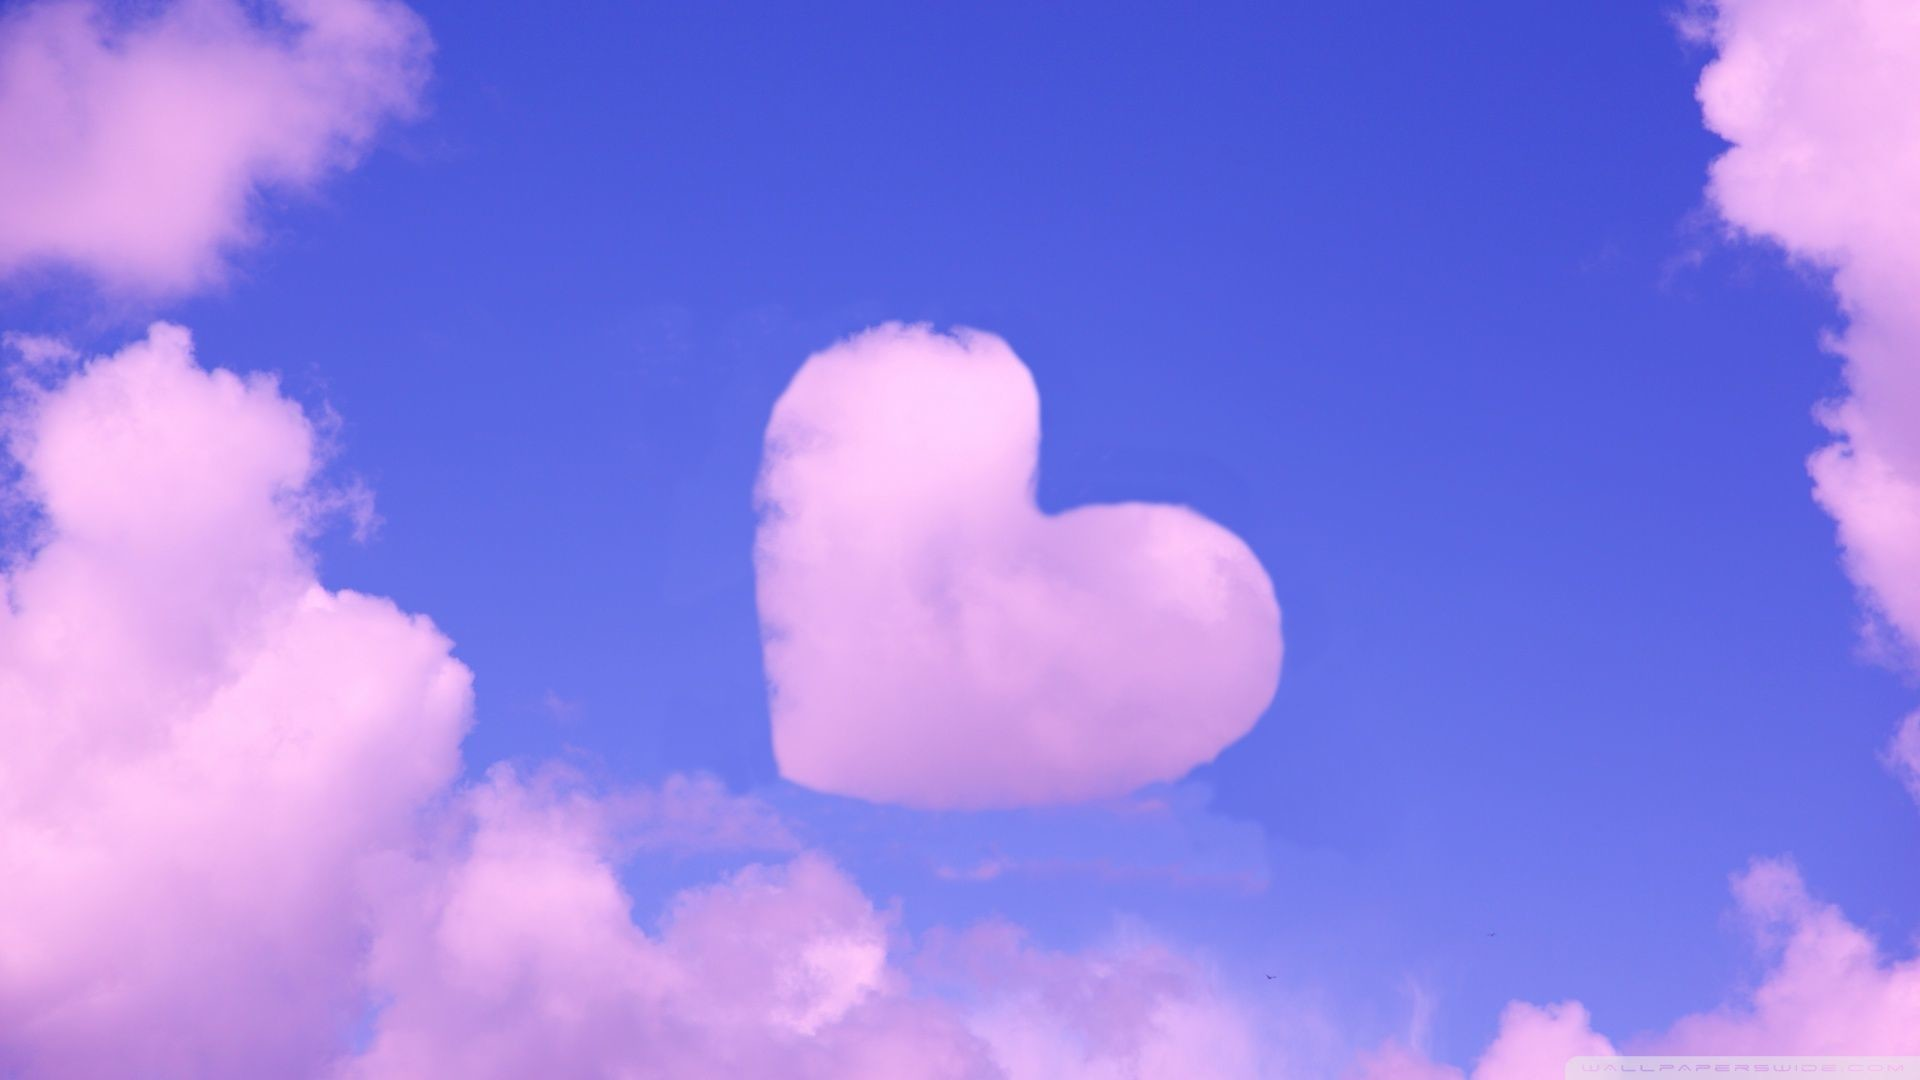 Hot Pink Heart Background Wallpaper Stock Photo